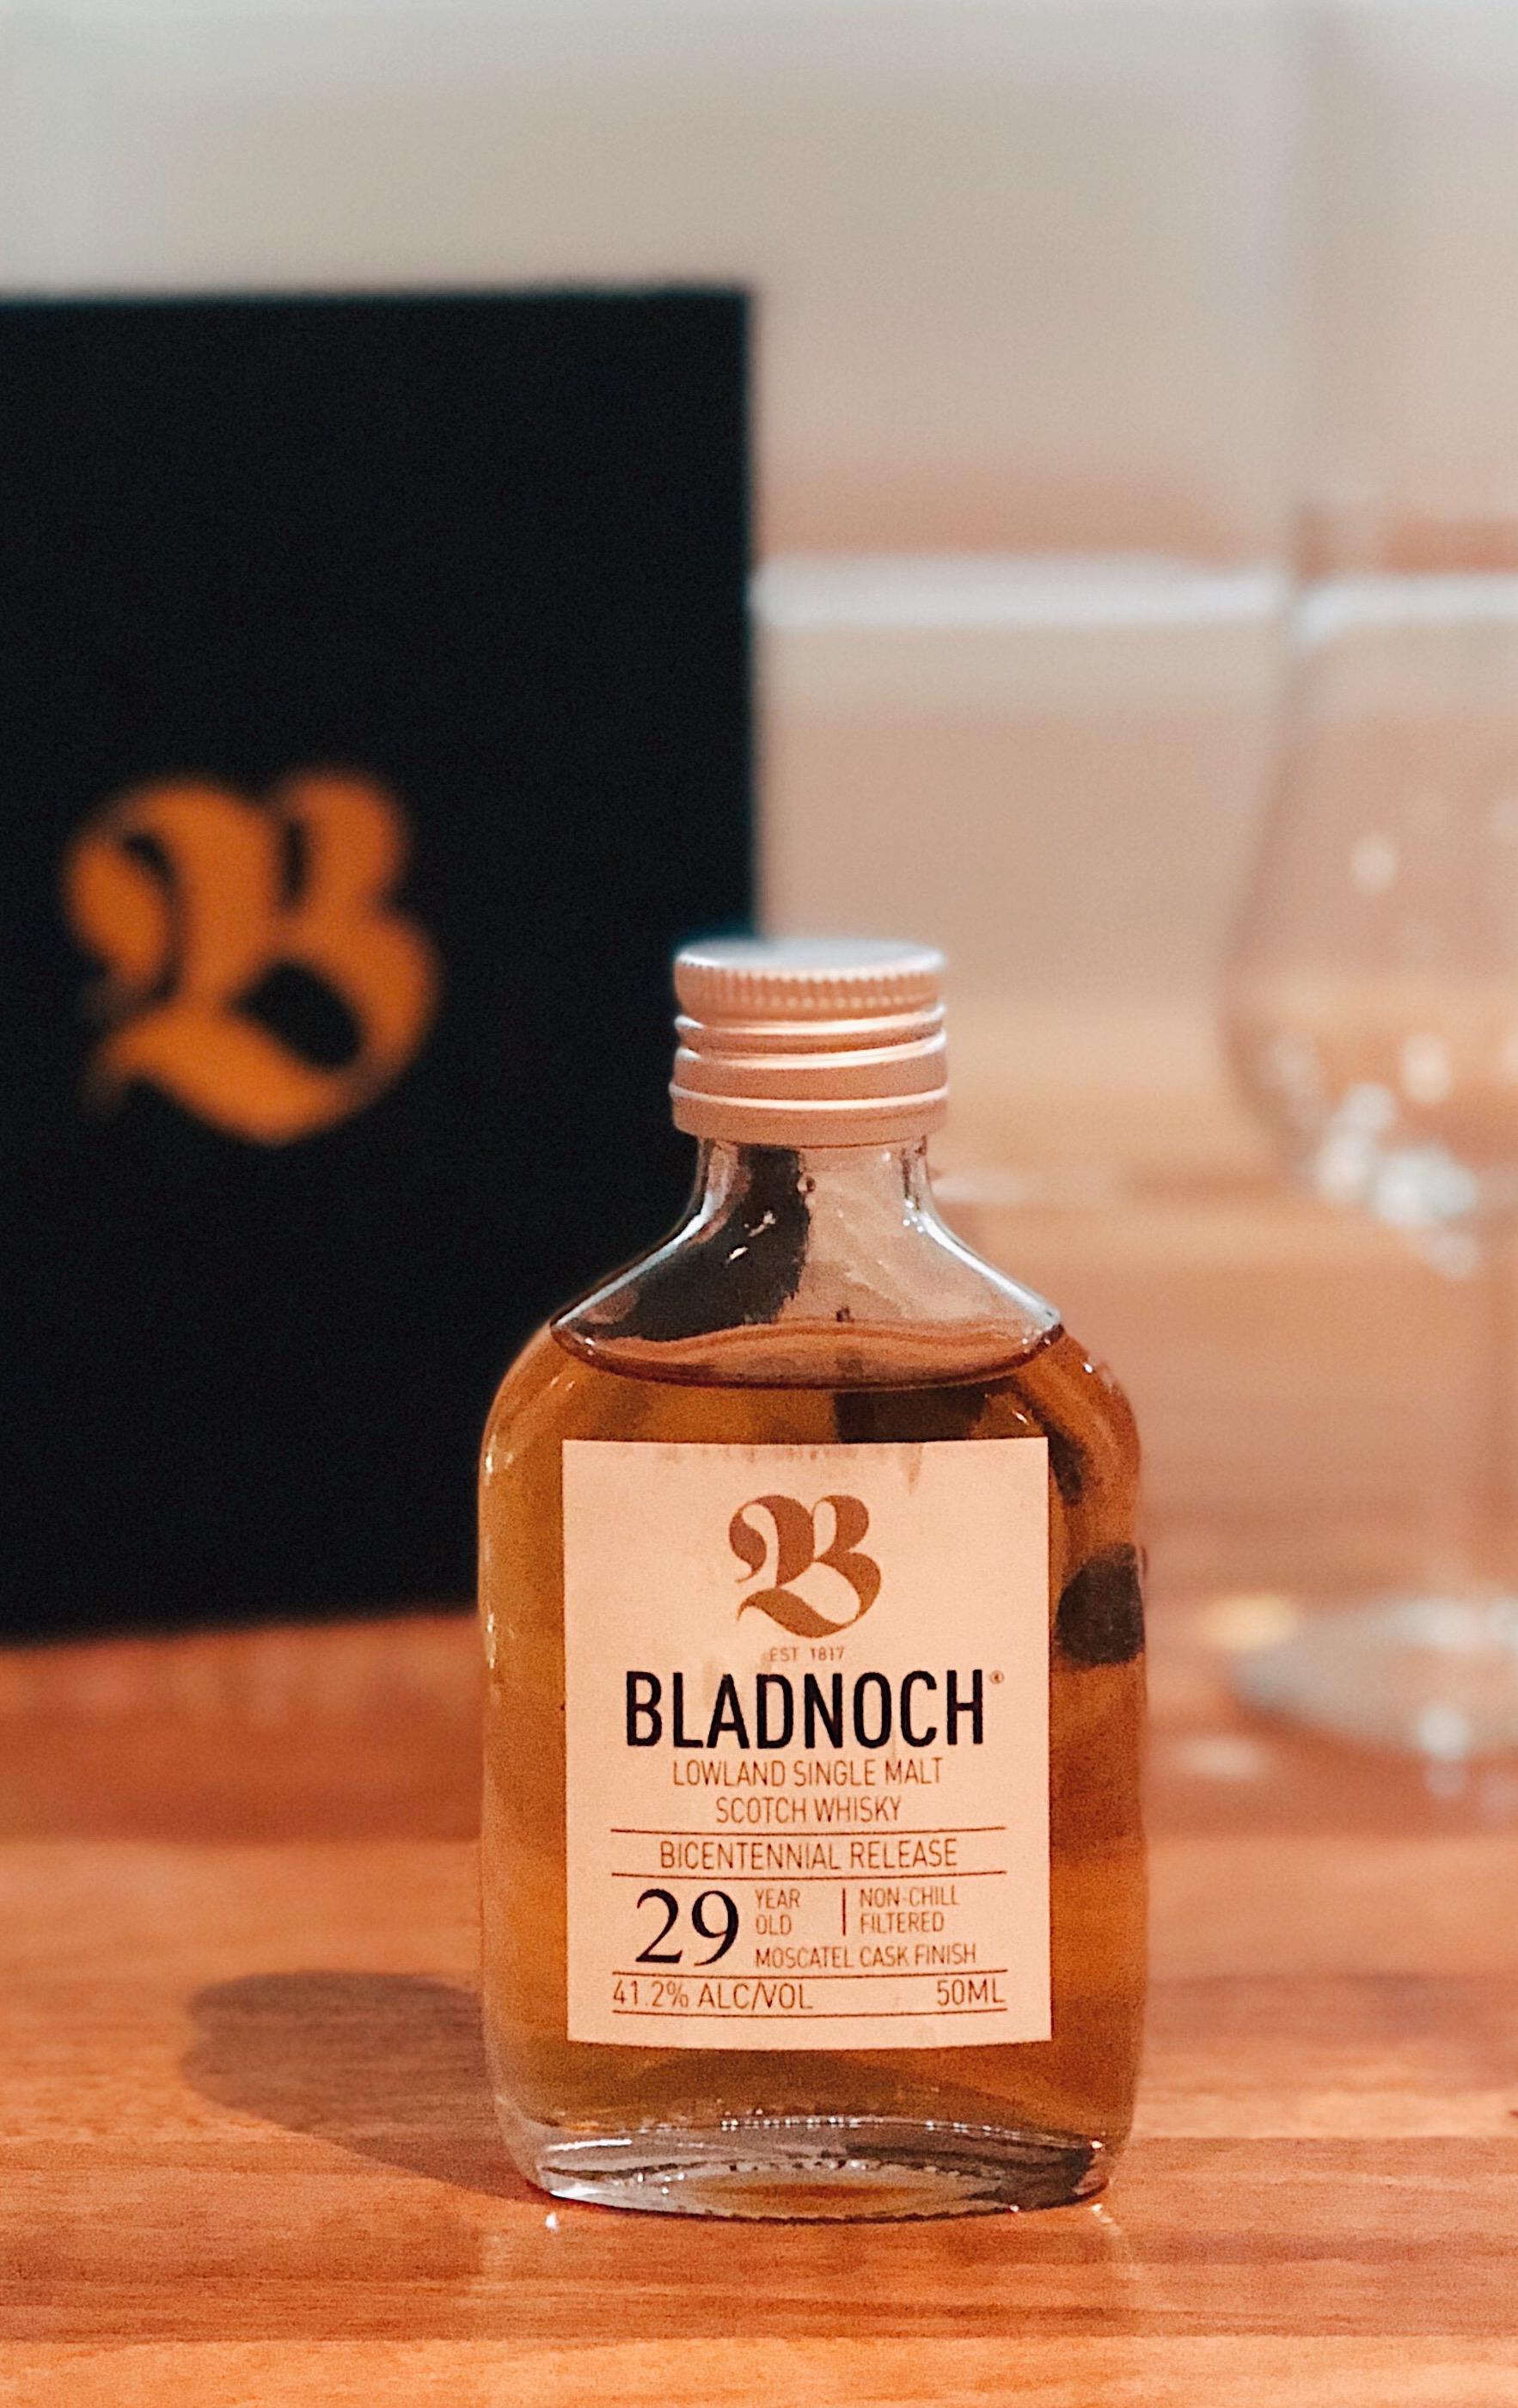 bladnoch bicentennial